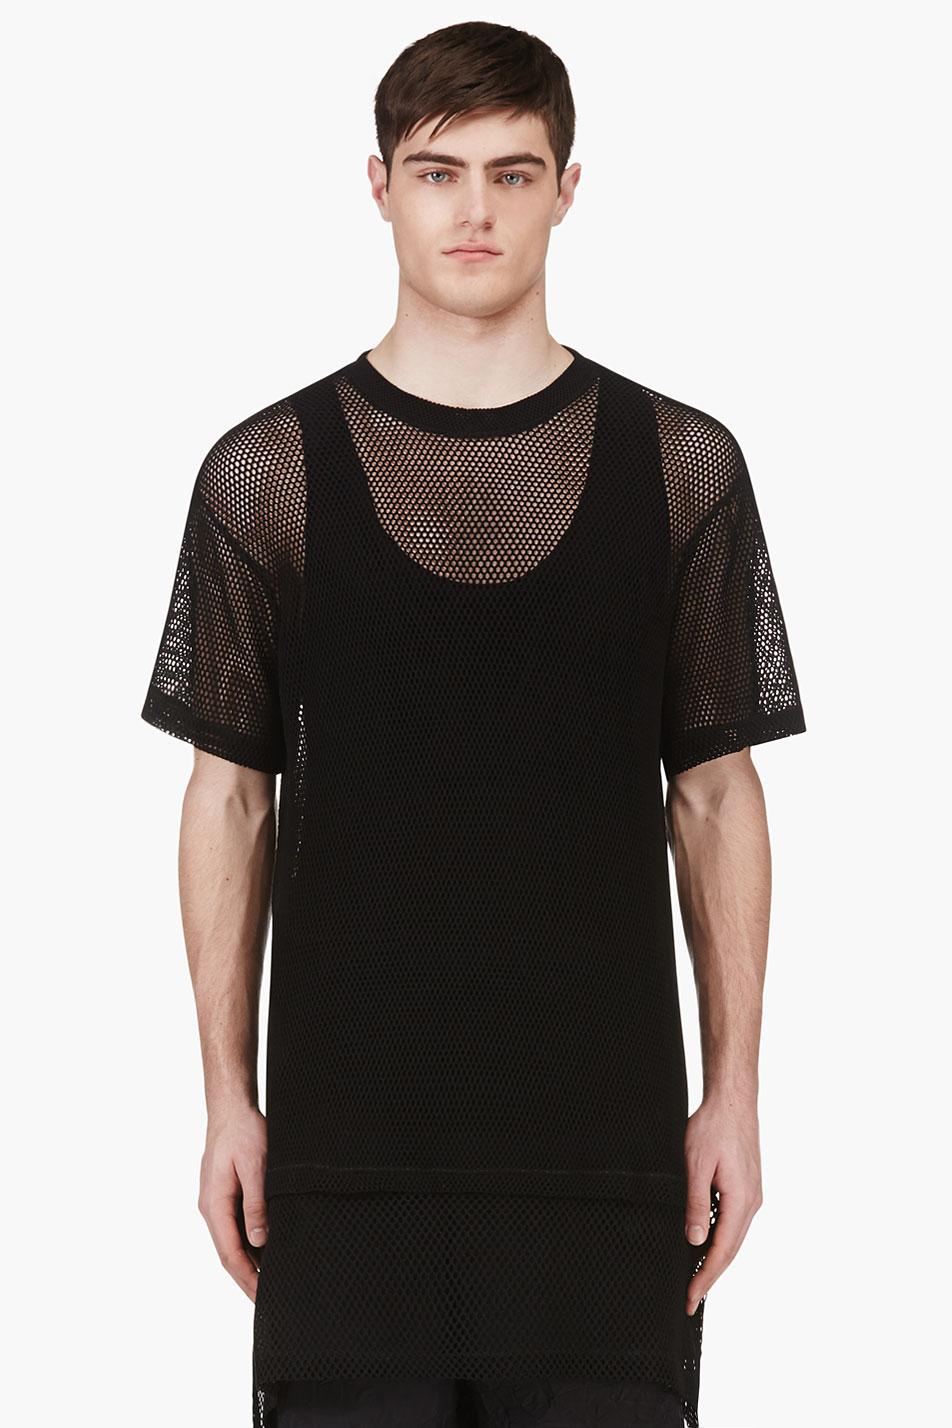 ktz black oversized mesh t shirt in black for men lyst. Black Bedroom Furniture Sets. Home Design Ideas